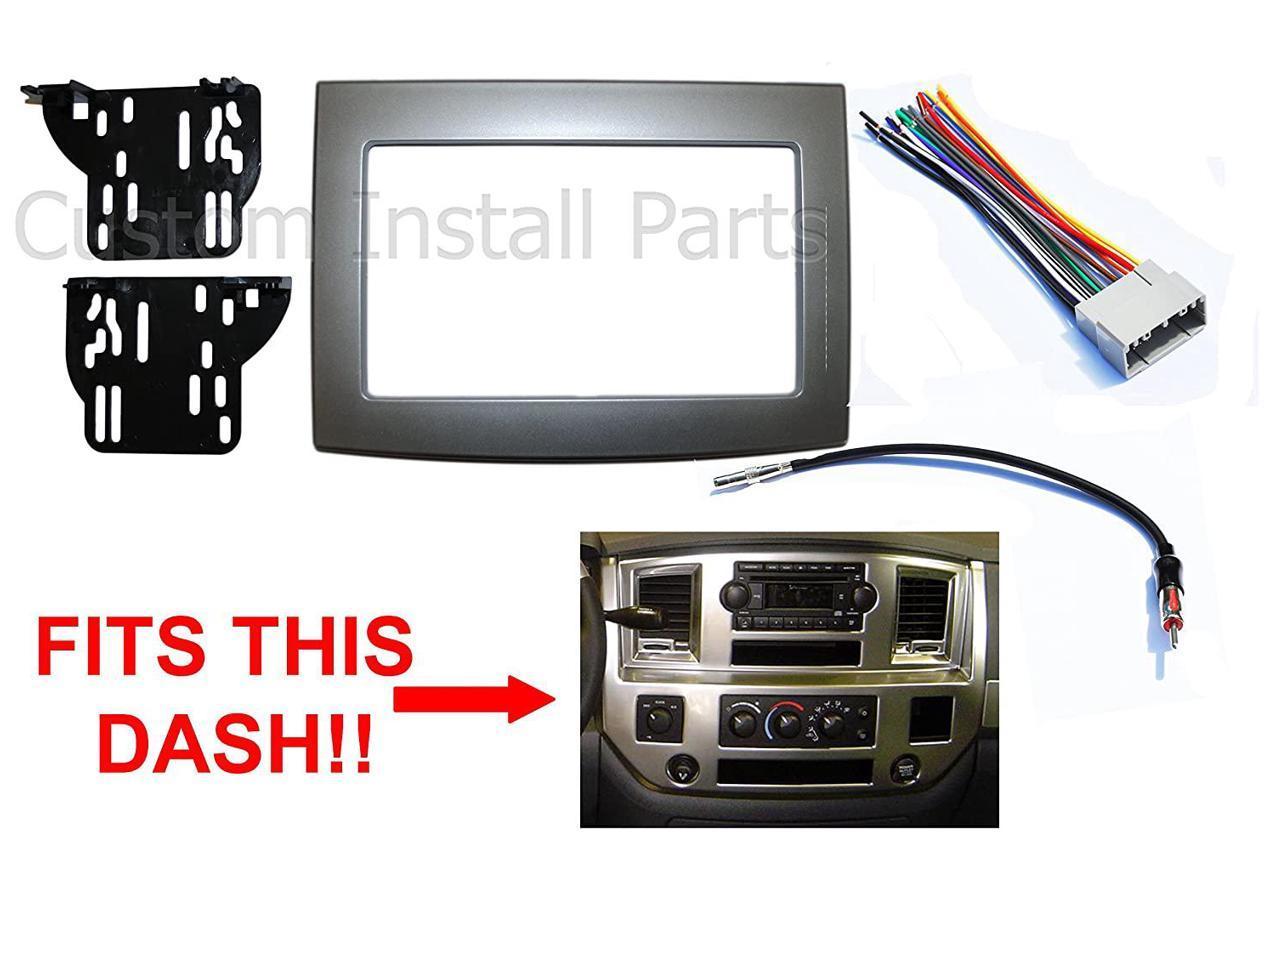 Silver Double Din Dash Install Kit w/Wiring Harness Radio Stereo Fits Dodge  Ram - Newegg.comNewegg